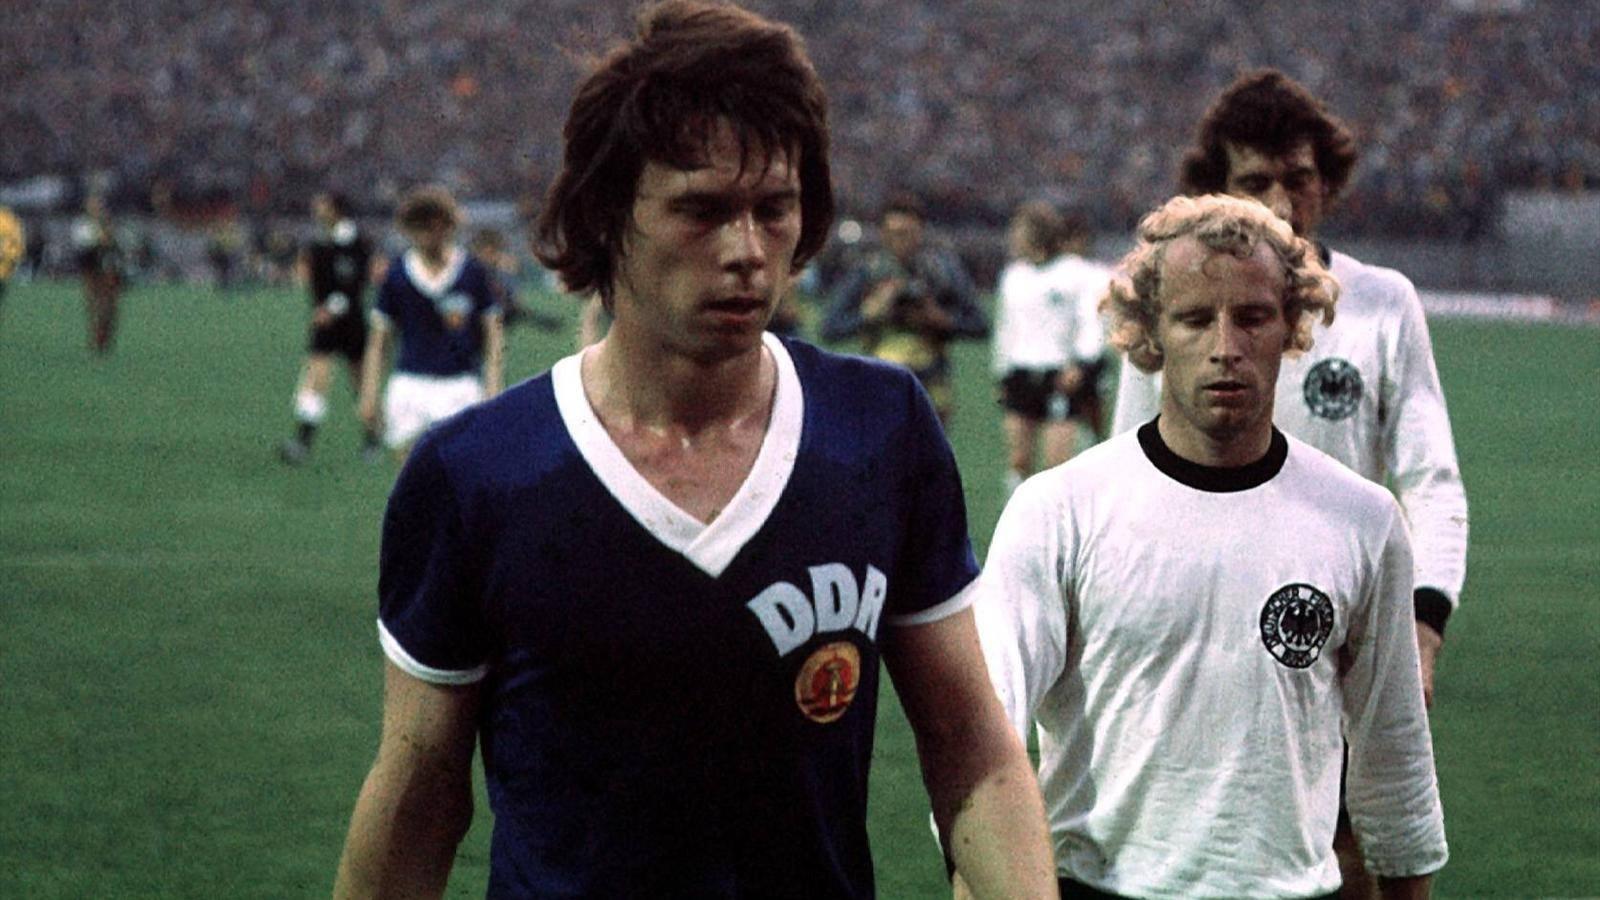 Jurgen Sparwasser e Berti Vogts a Monaco 74